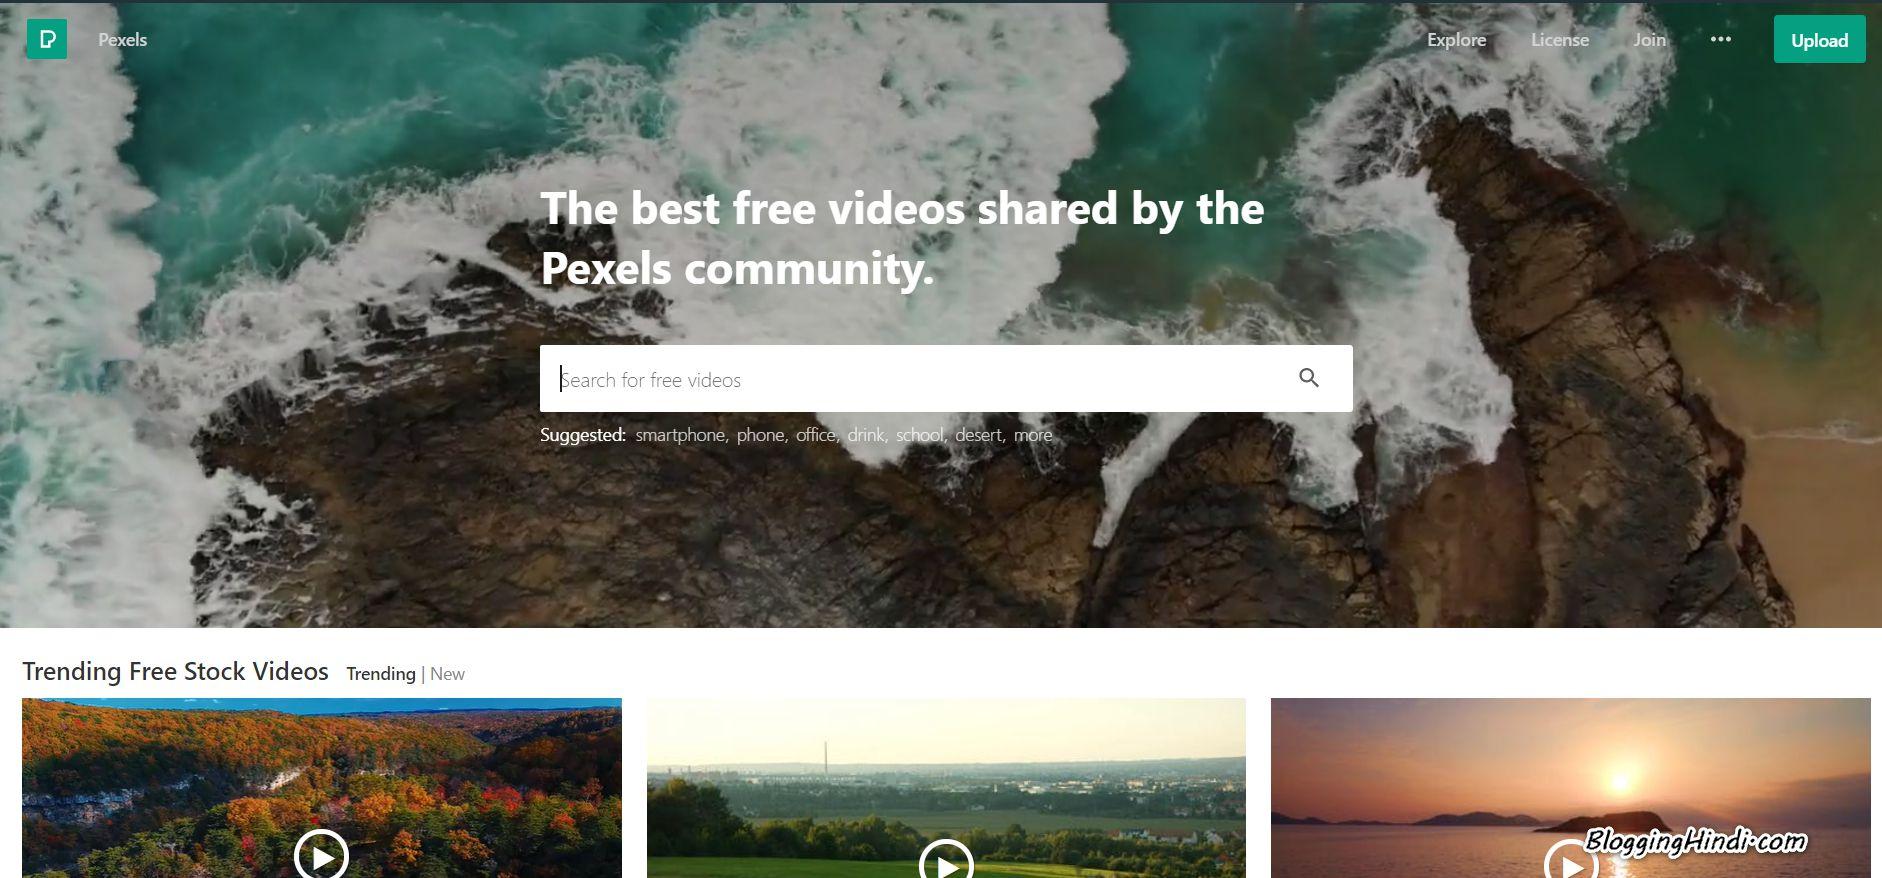 YouTube Ke Liye Creative Common Video Download Kaha Se Kare? Top 5 Websites 1